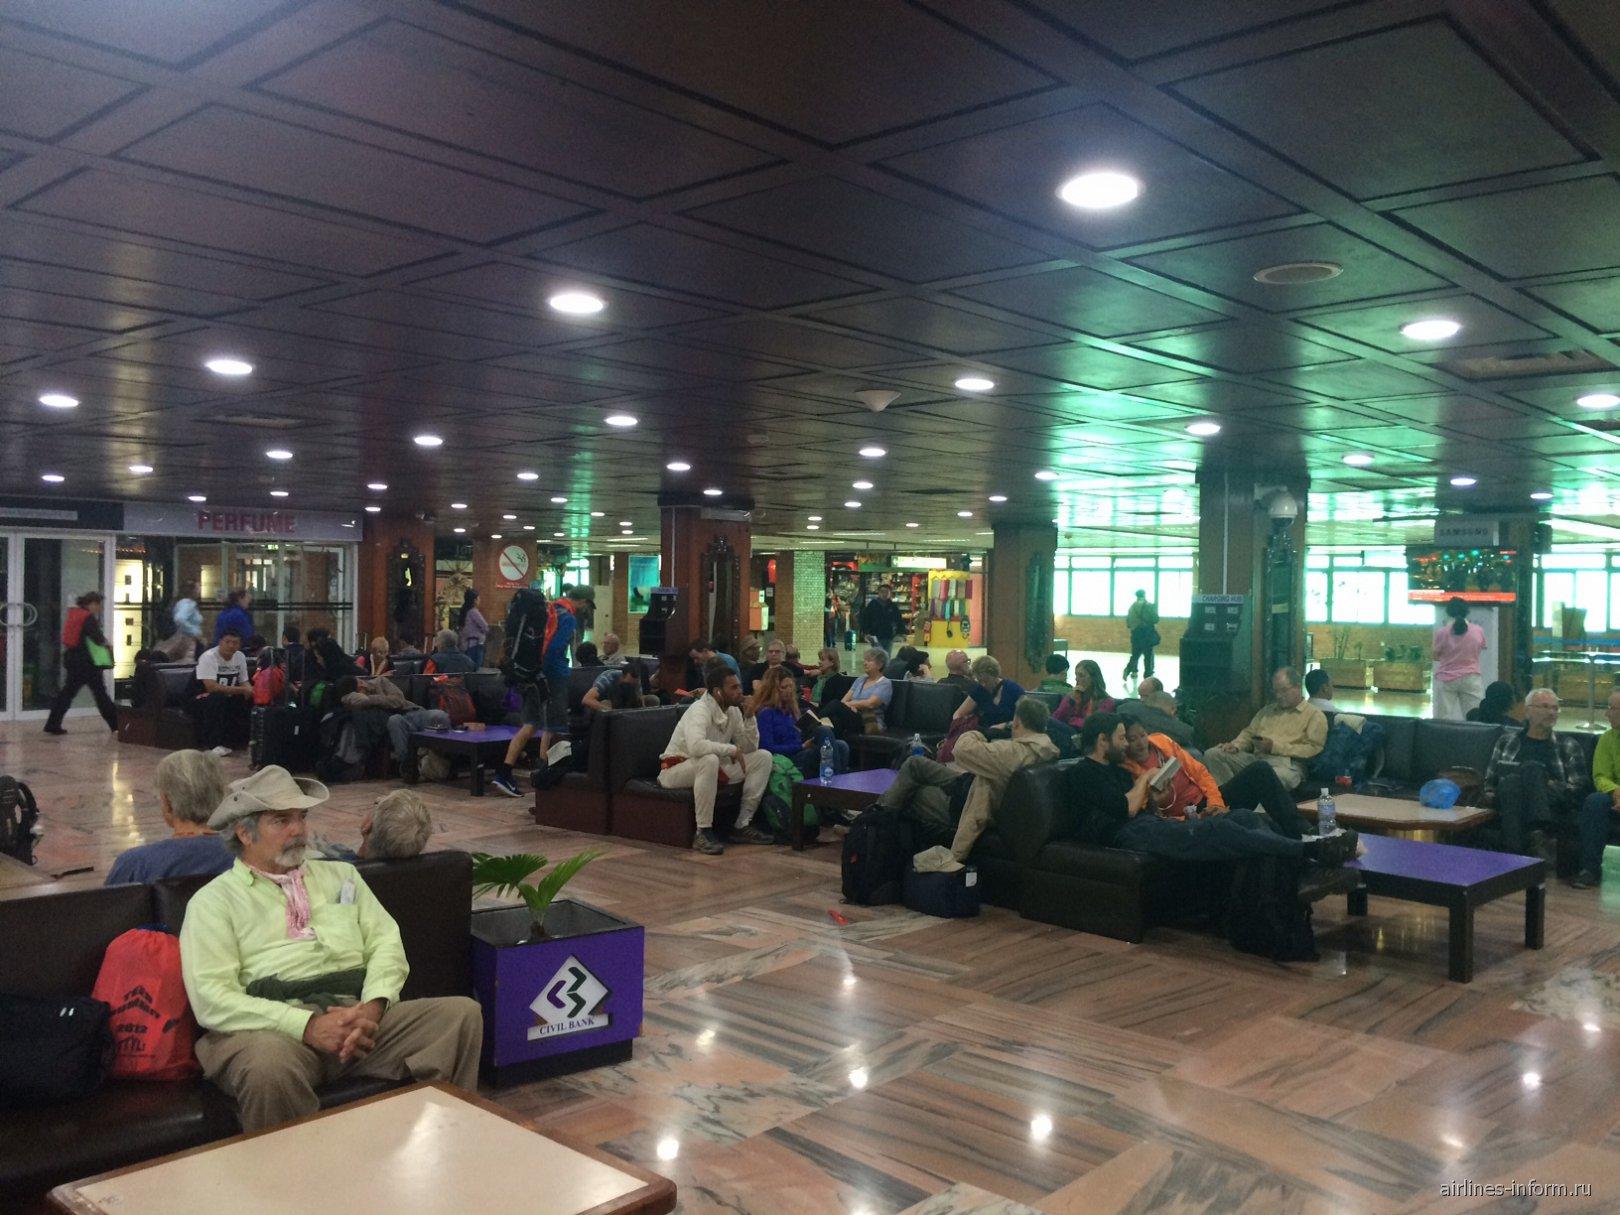 Зал ожидания в аэропорту Катманду